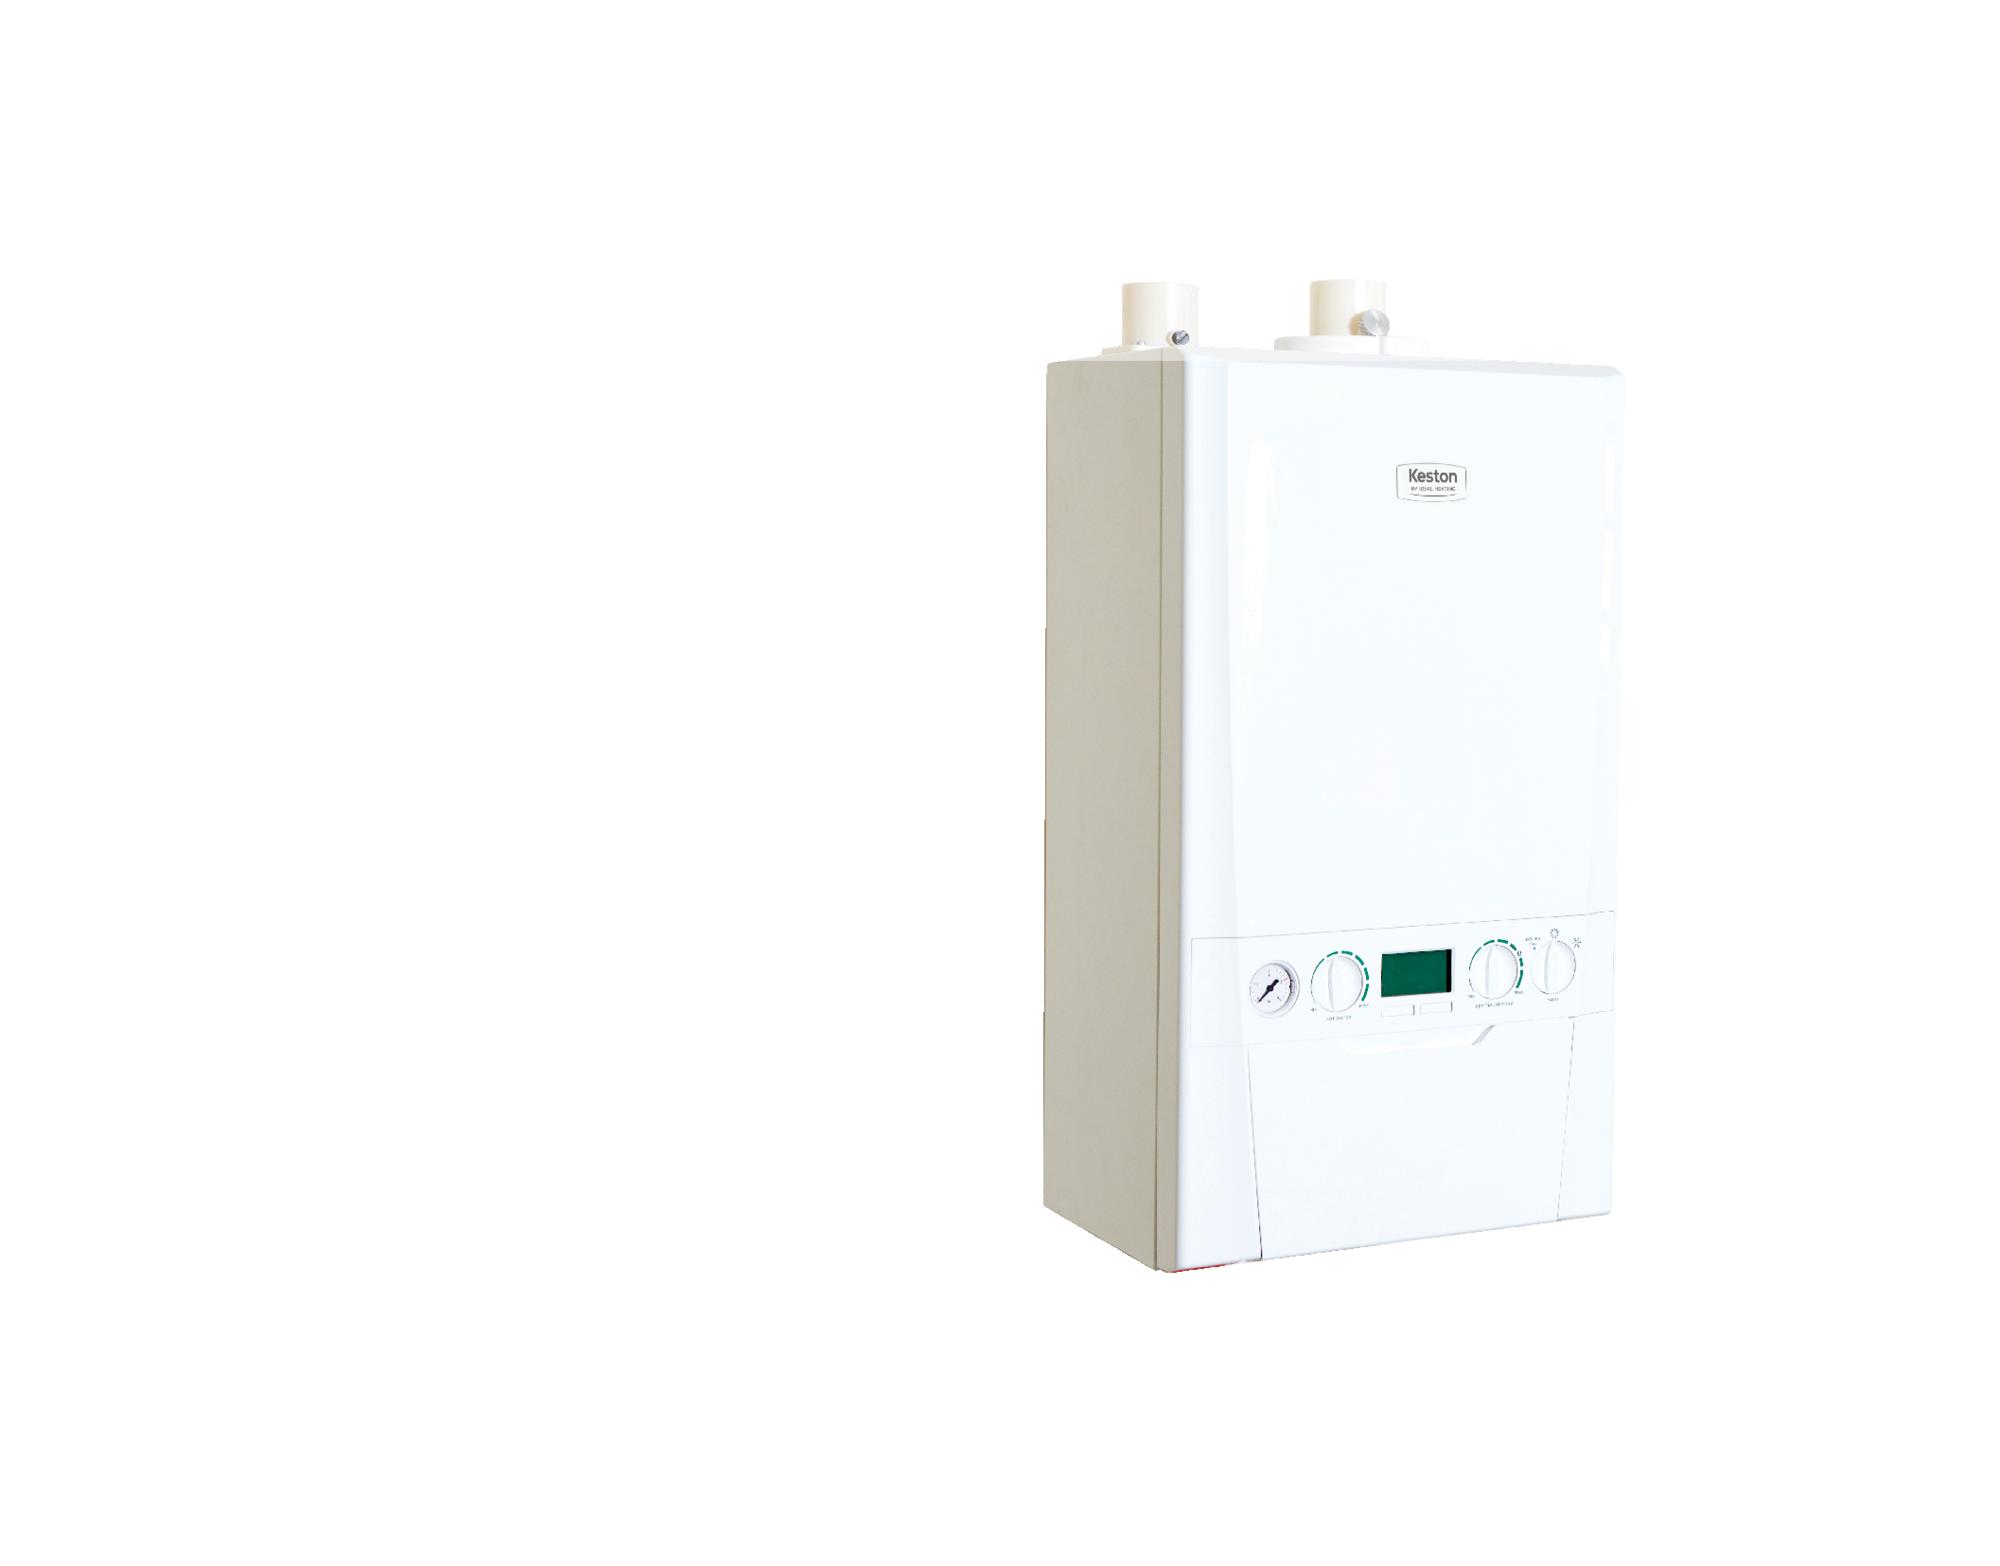 Keston Connect Site image